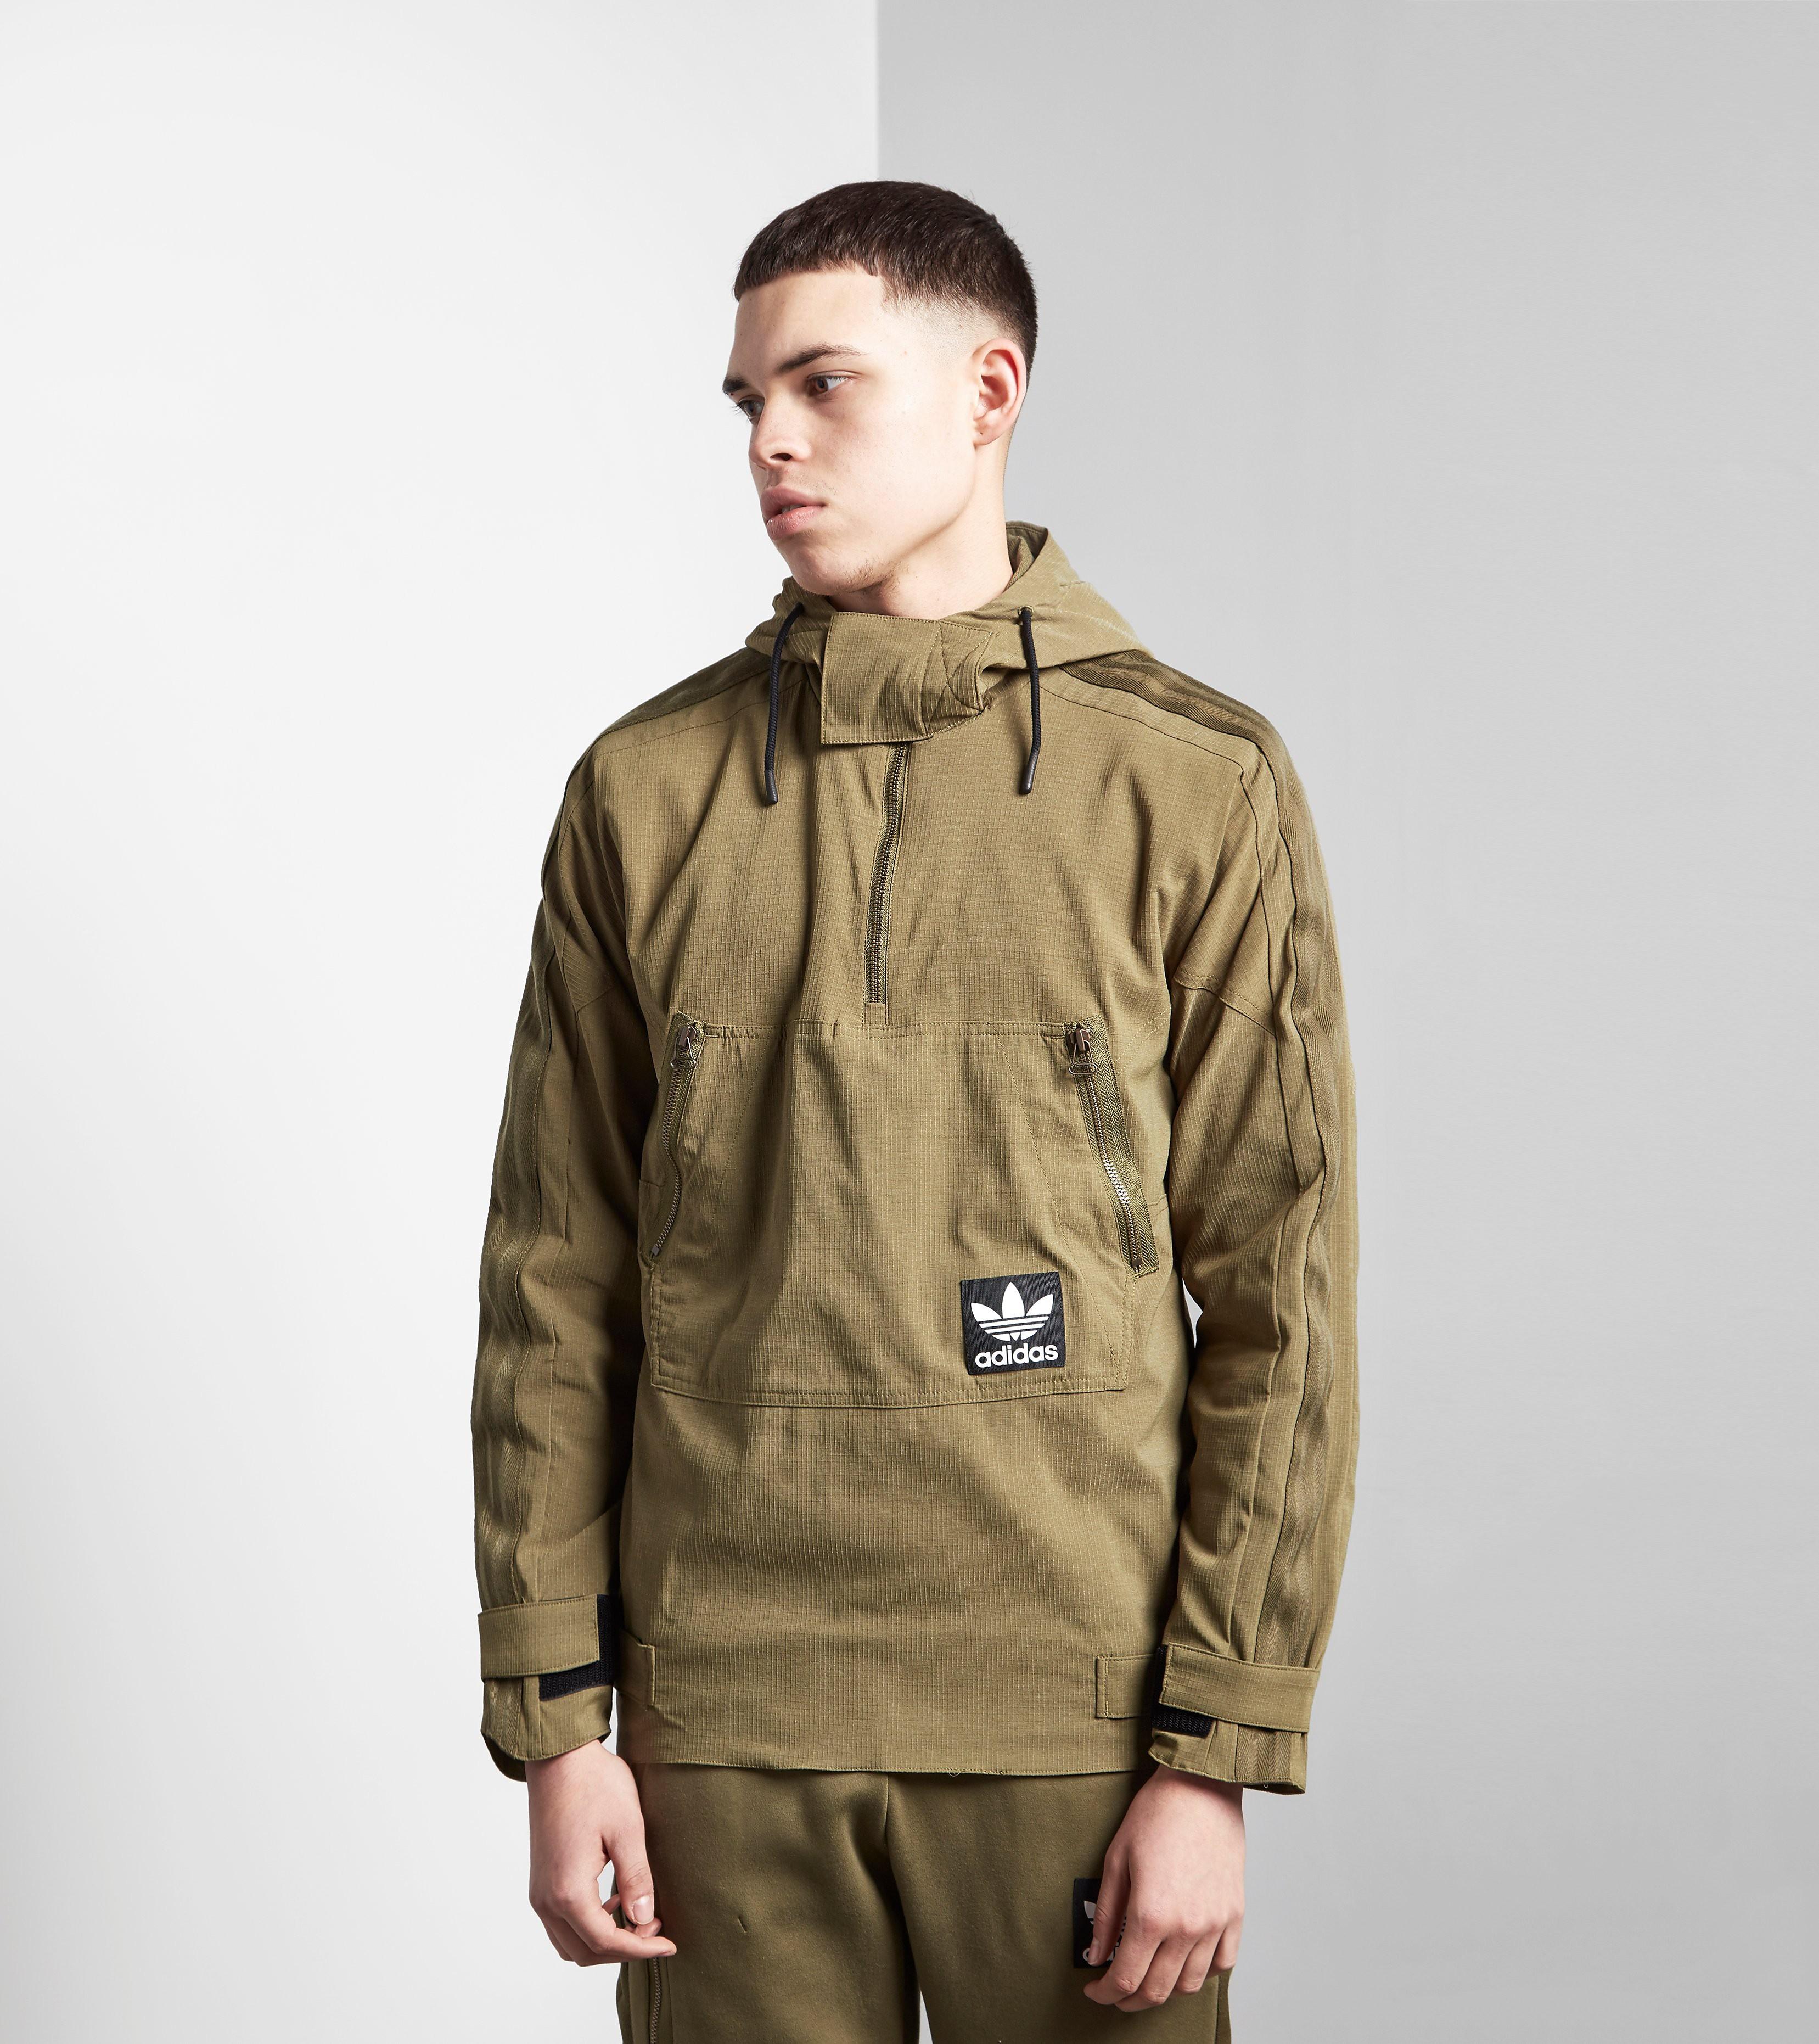 adidas Originals Trefoil Windbreaker Jacket